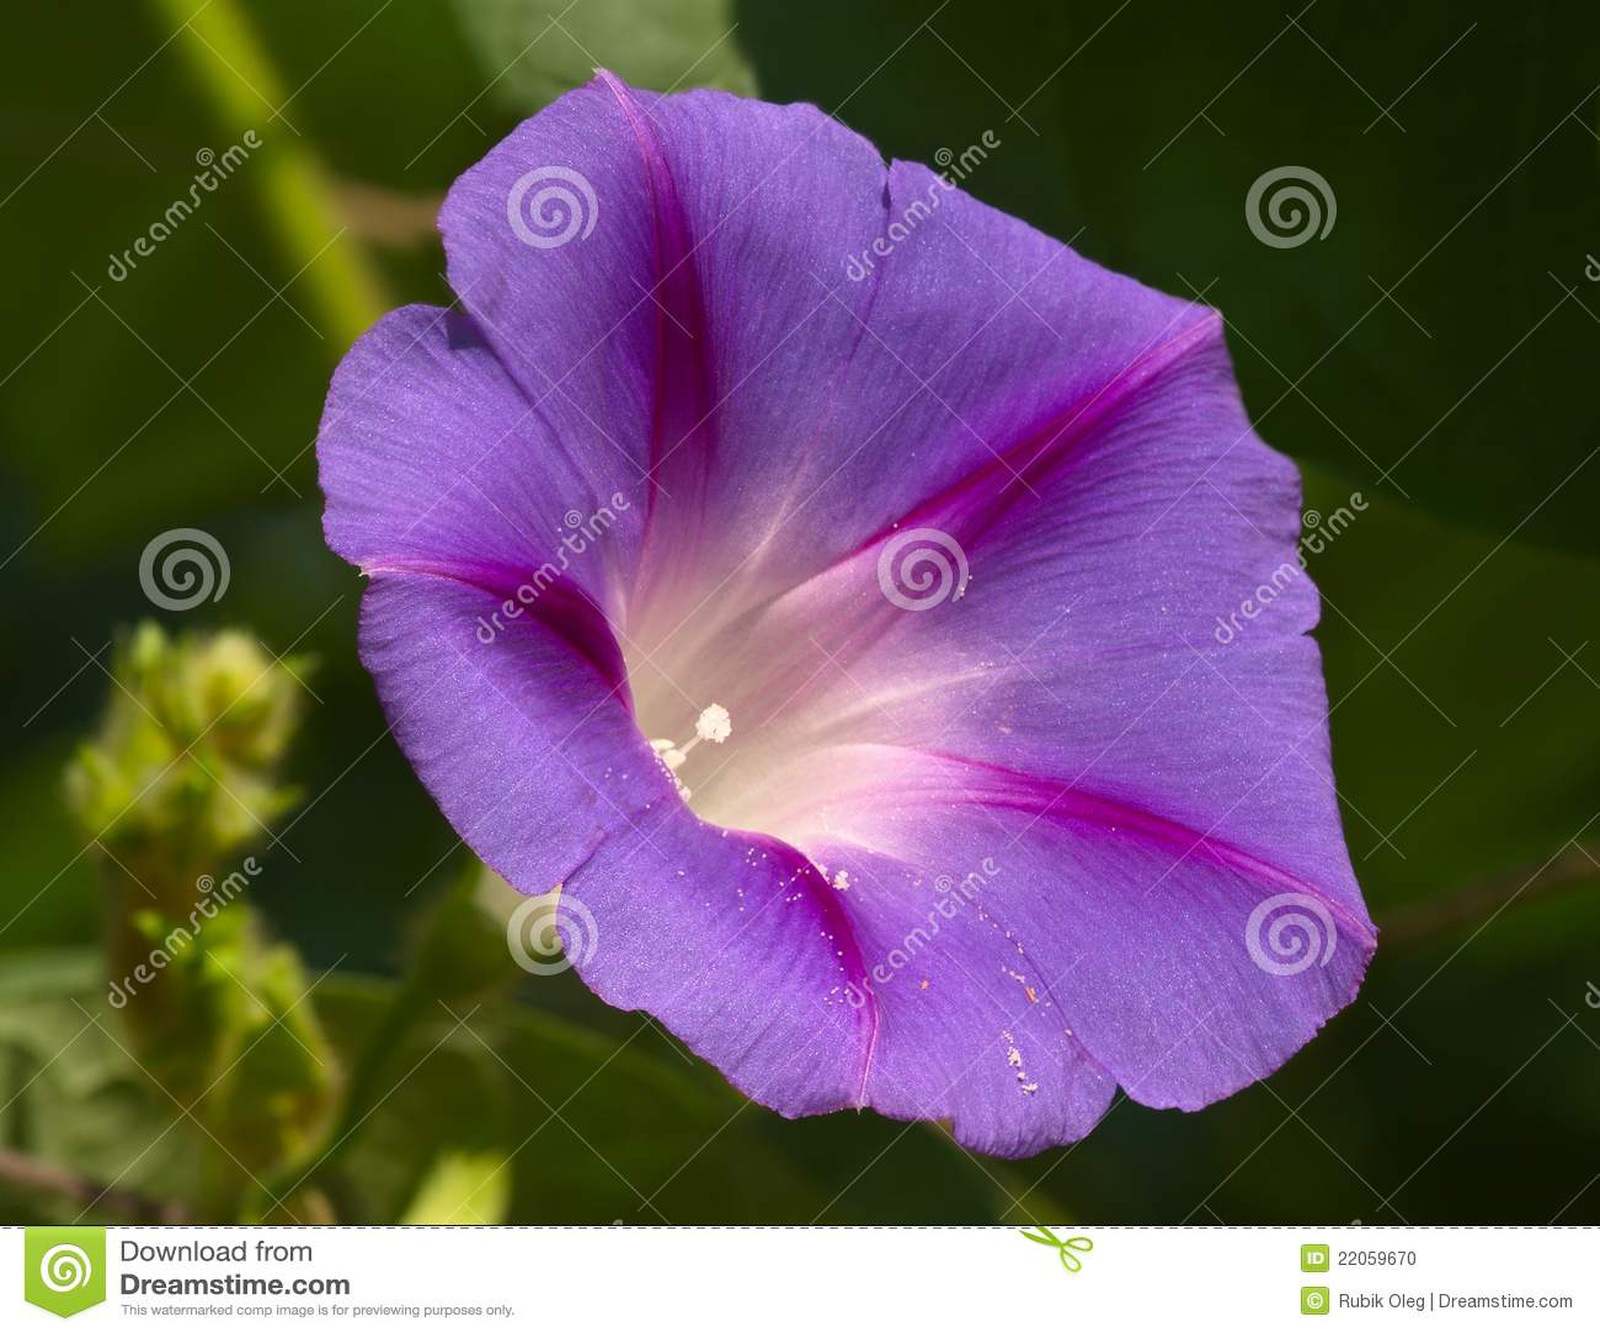 violet flower stock photo  image, Beautiful flower